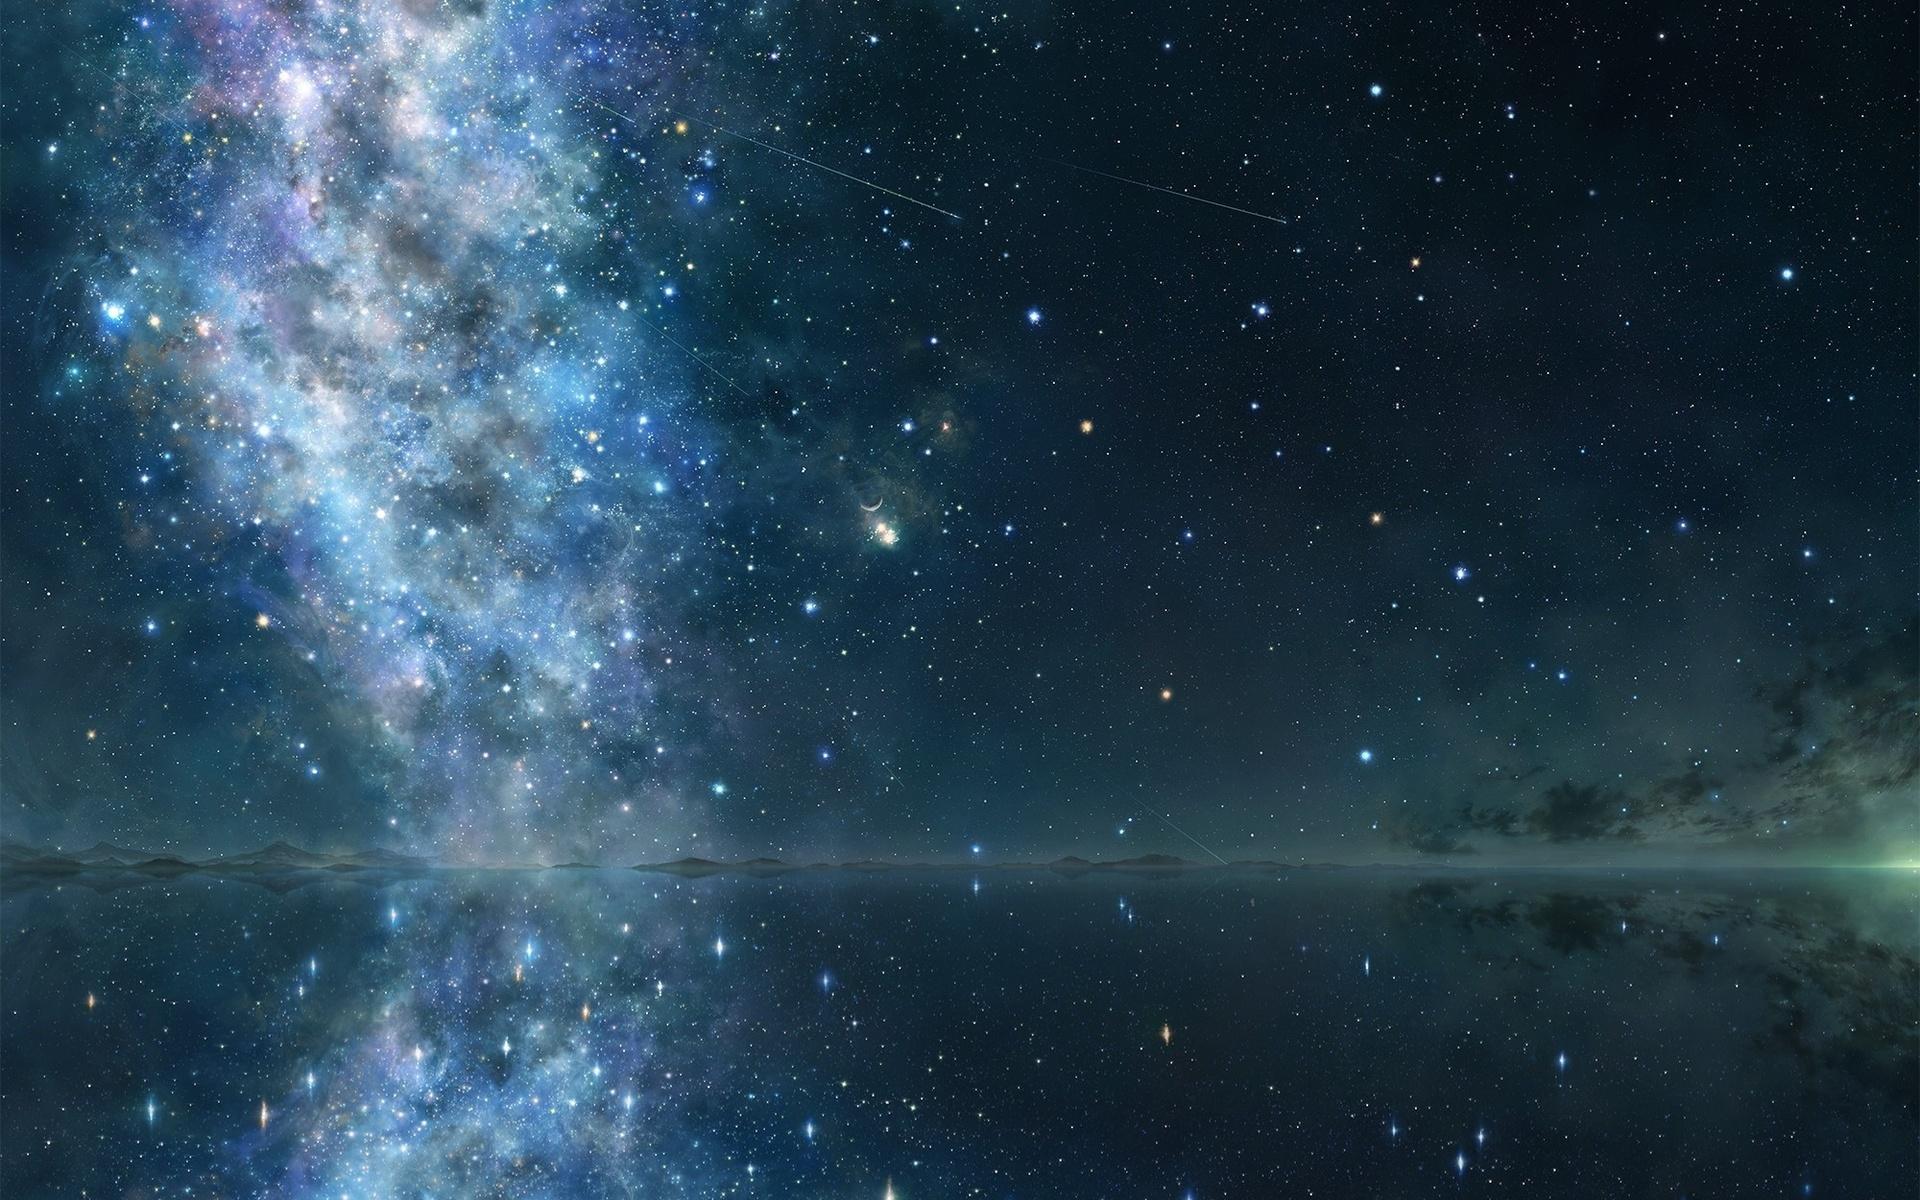 Wallpaper Stars Sky Night - WallpaperSafari